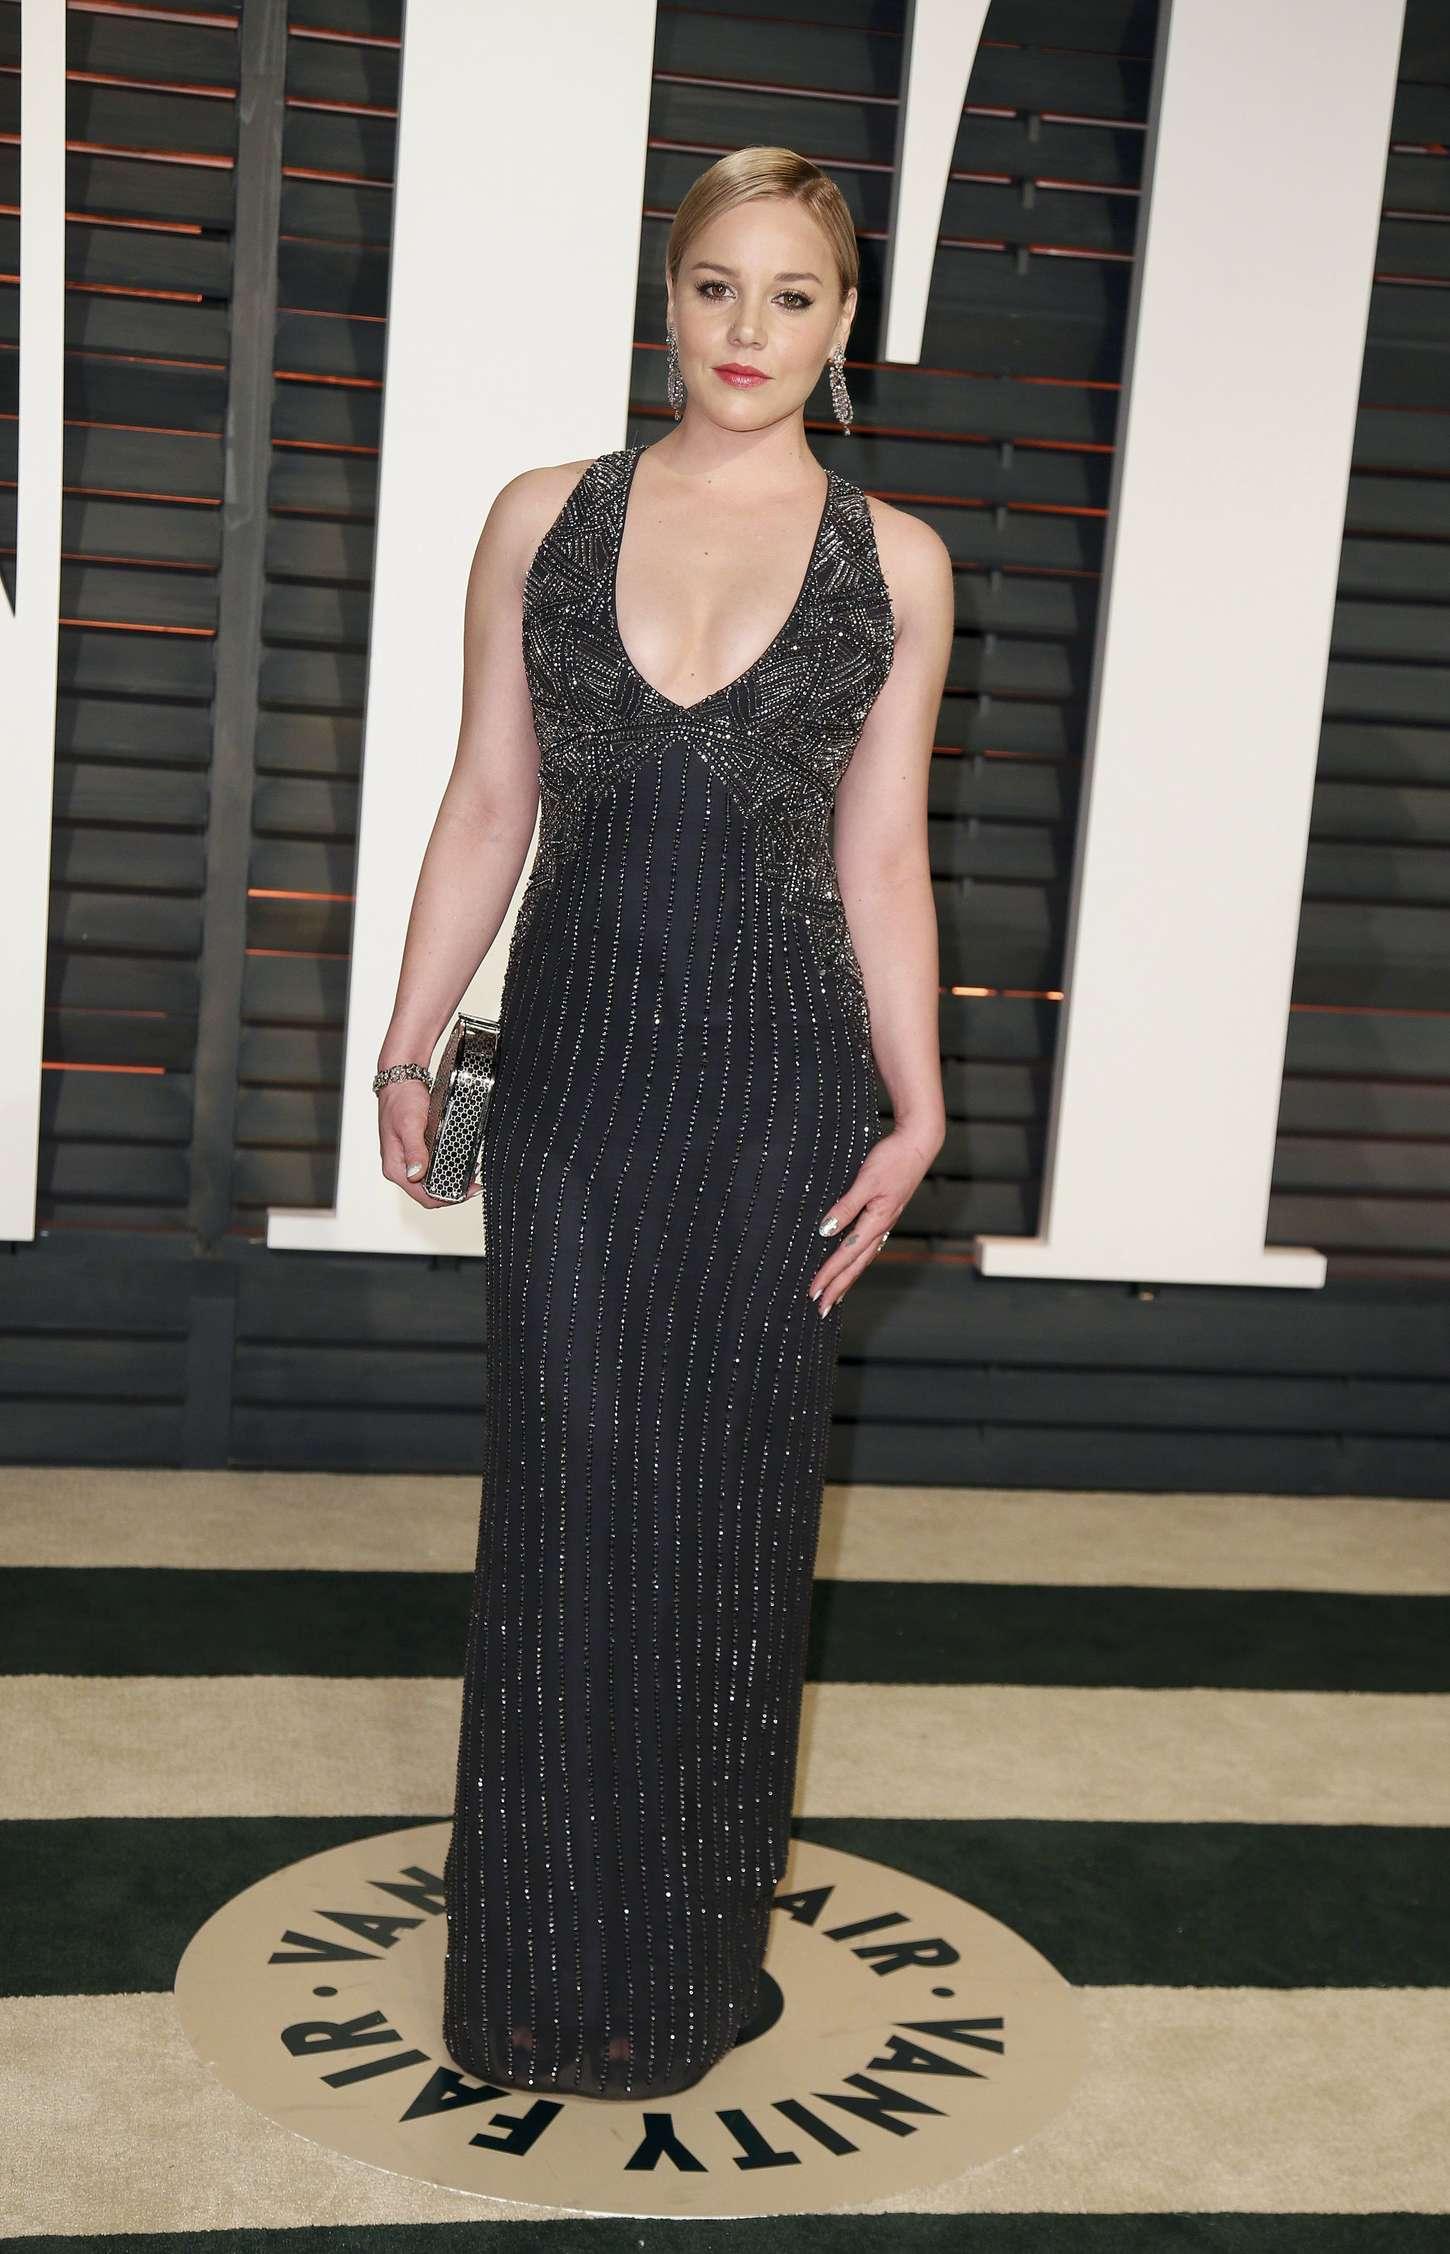 Abbie Cornish 2015 : Abbie Cornish: 2015 Vanity Fair Oscar Party -02